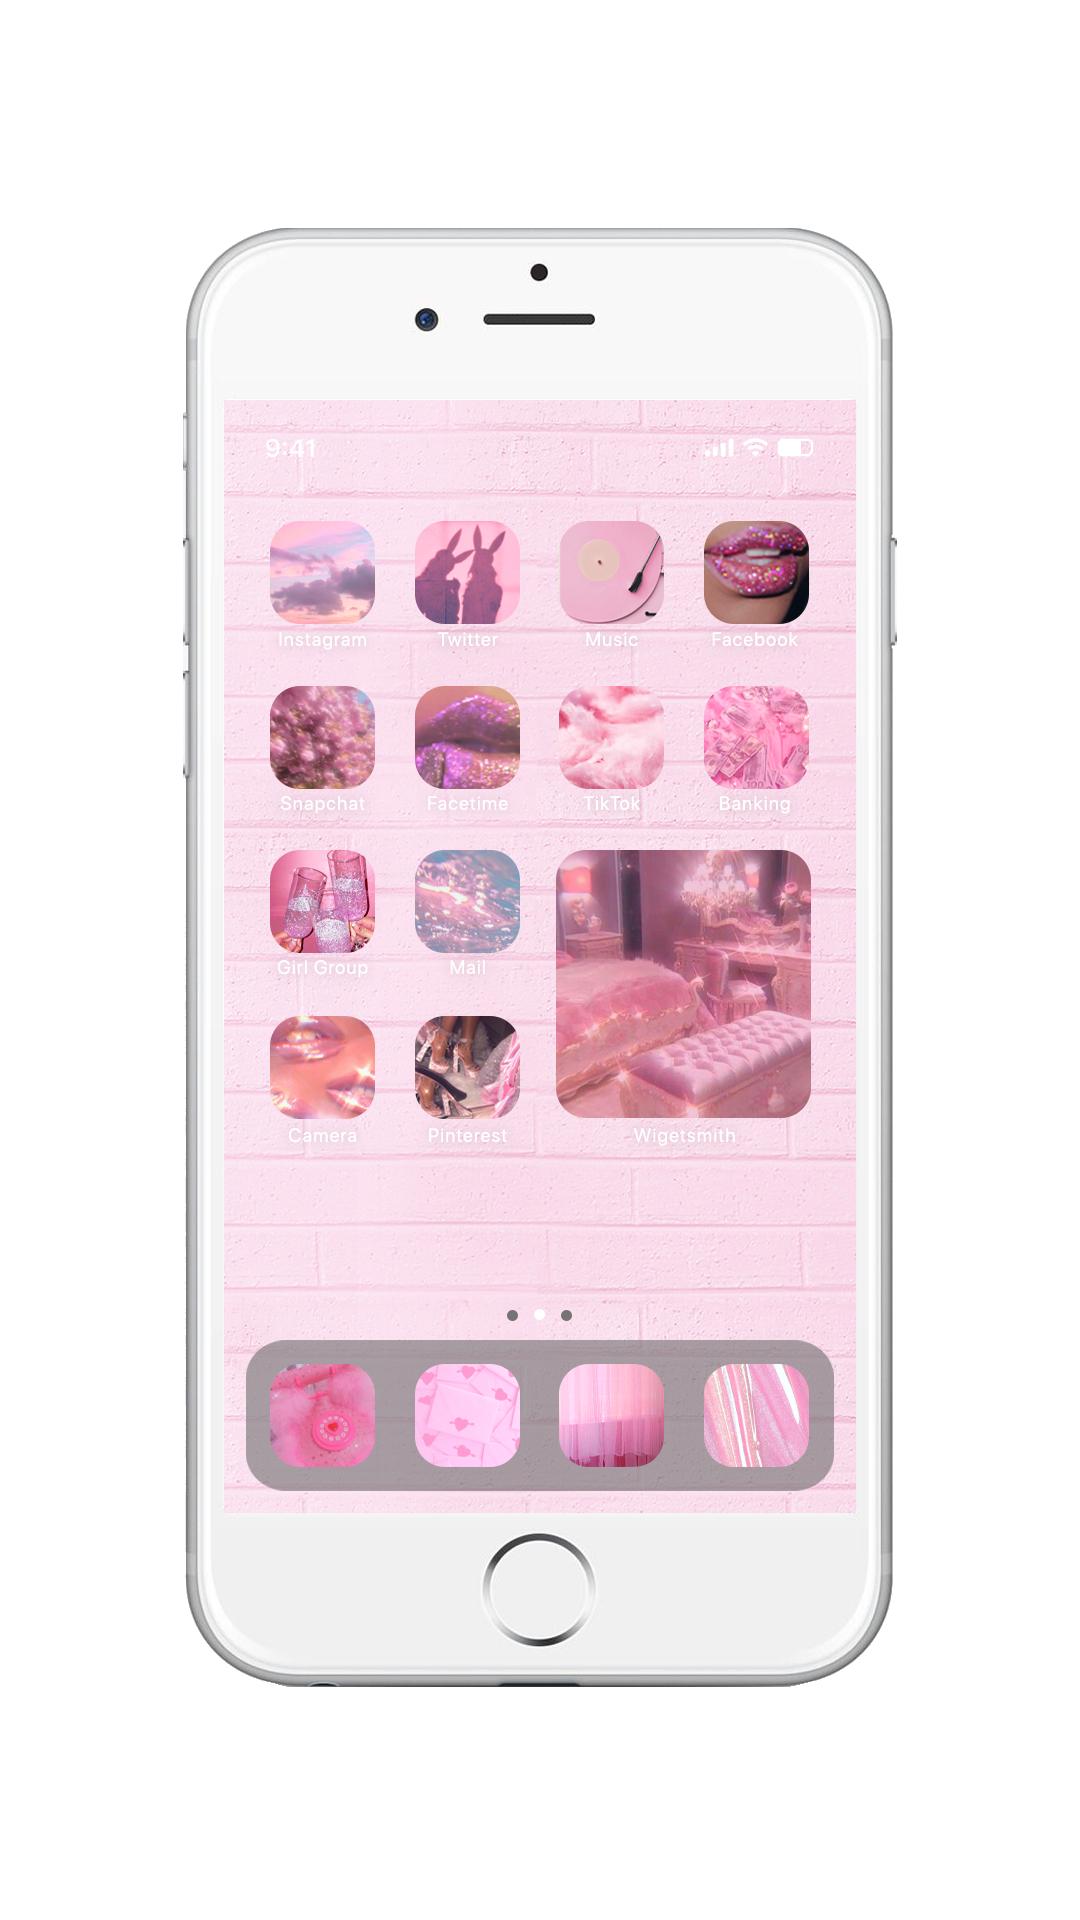 widget iphone aesthetic